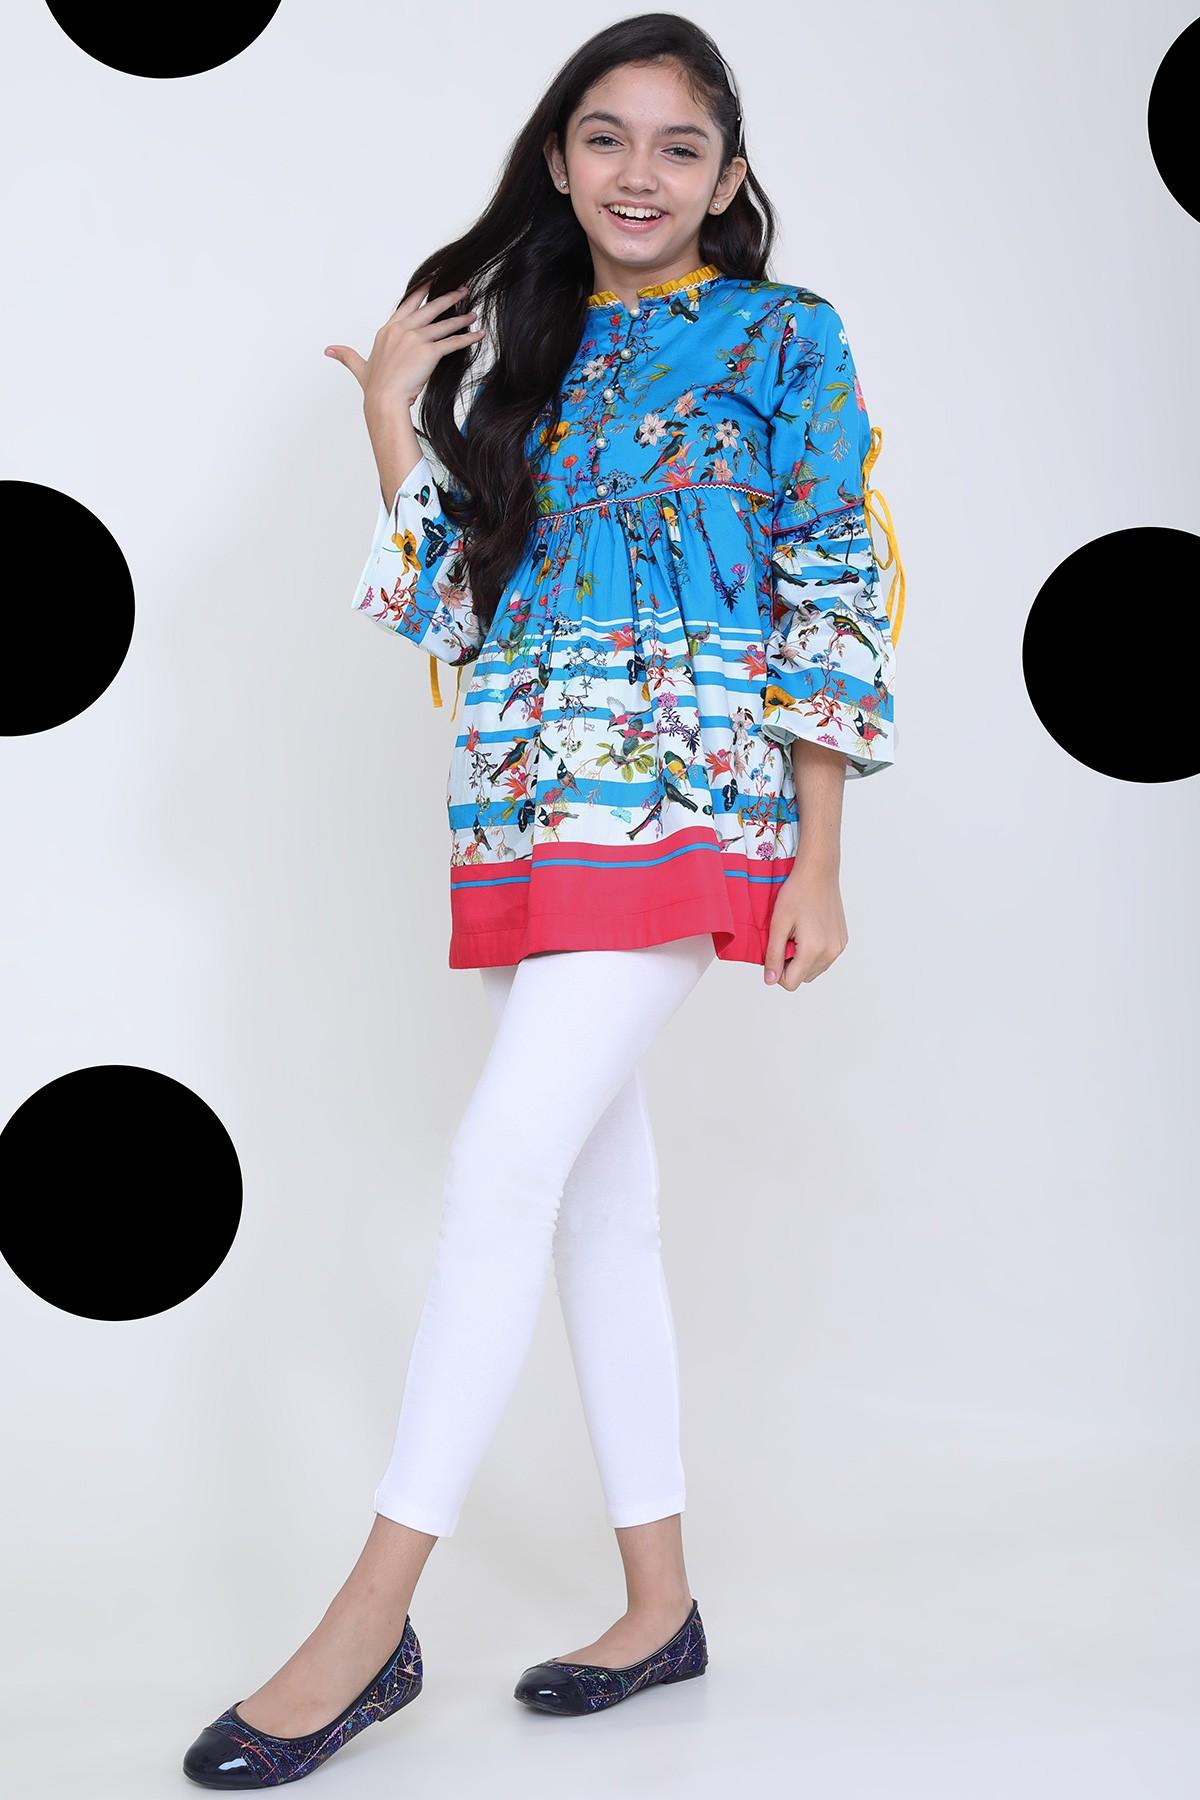 Al-Akaram winter MAK Collection Multi colorPrinted Cotton Satin MAK Girl Kurti